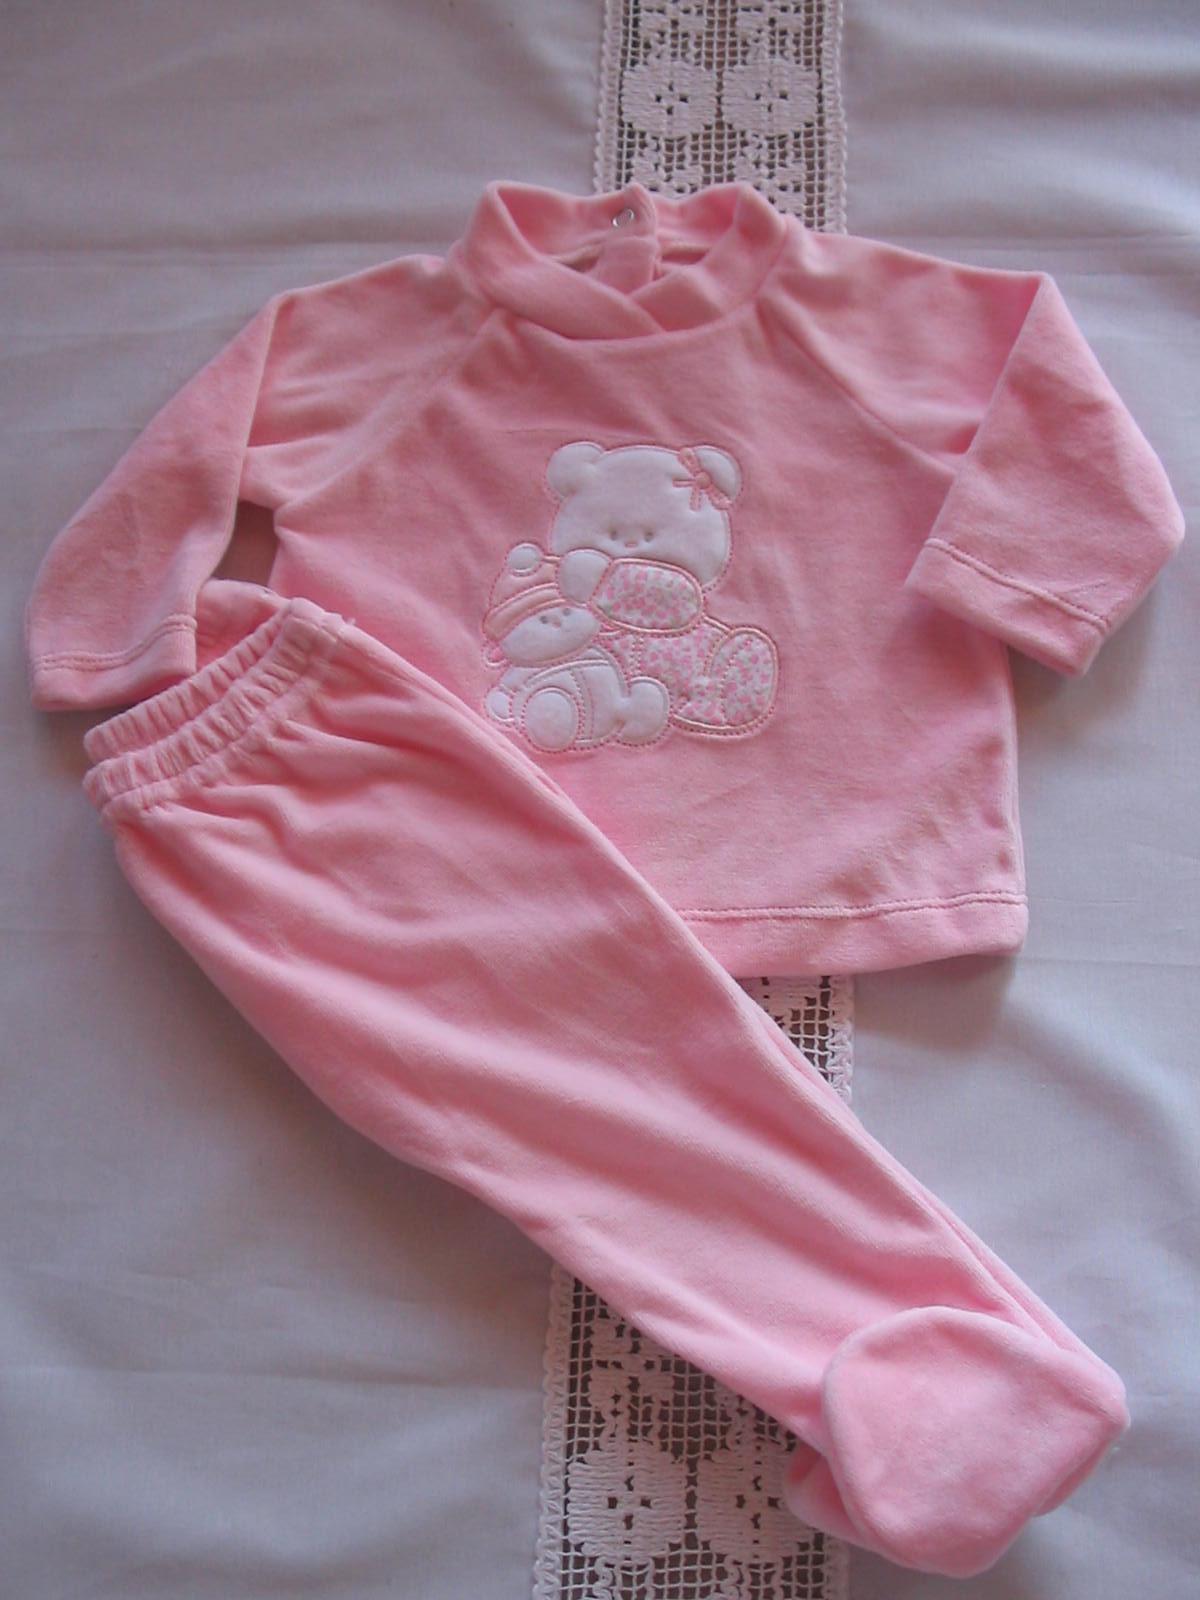 Varita magica ropa para bebe de 0 a 6 meses - Ropa bebe 0 meses ...